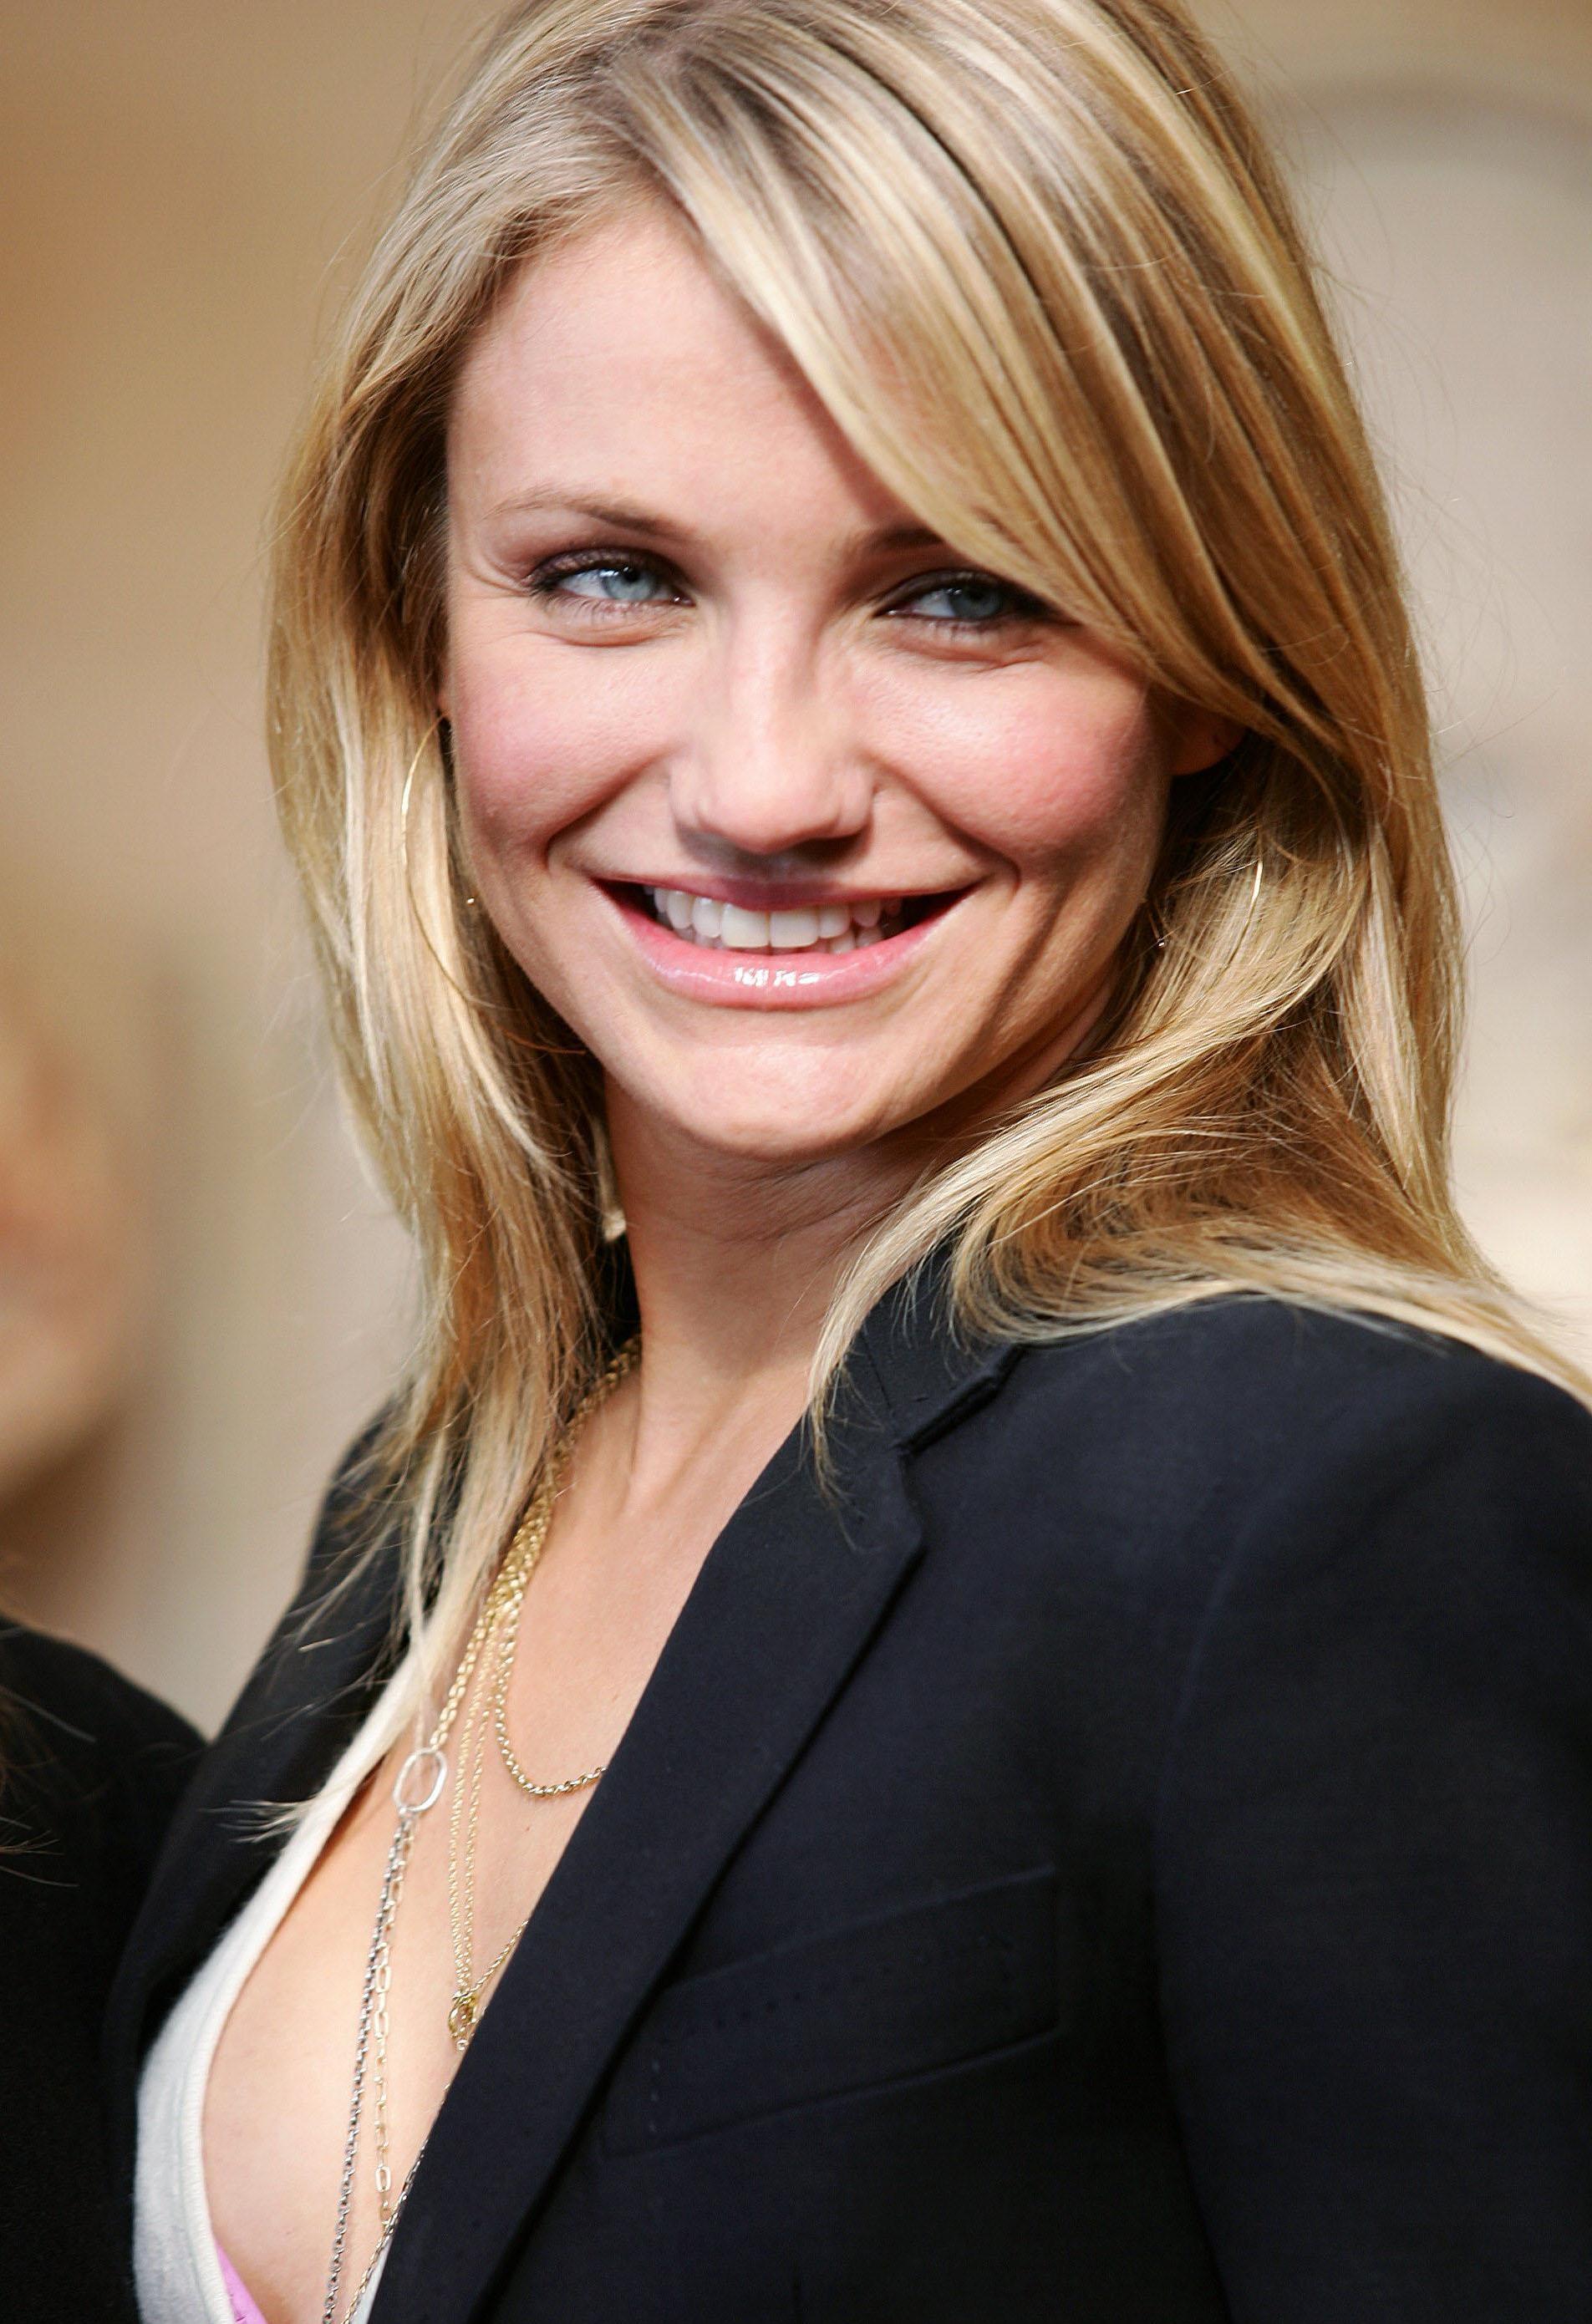 amerikanskie-aktrisi-foto